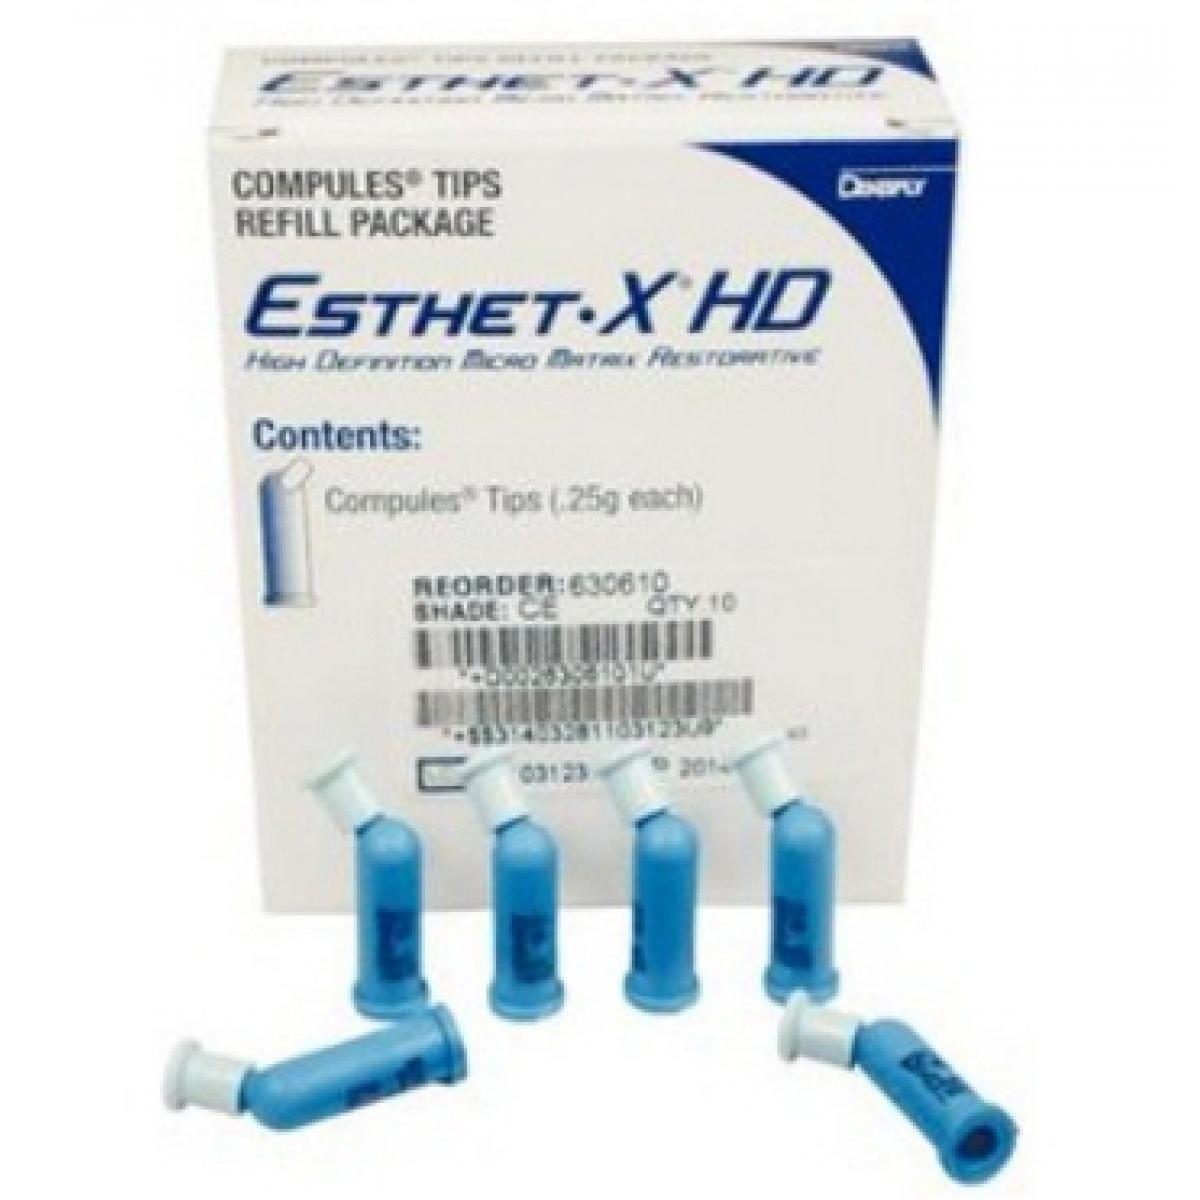 ESTHET XD D2 COMPULES 10U DENTSPLY -